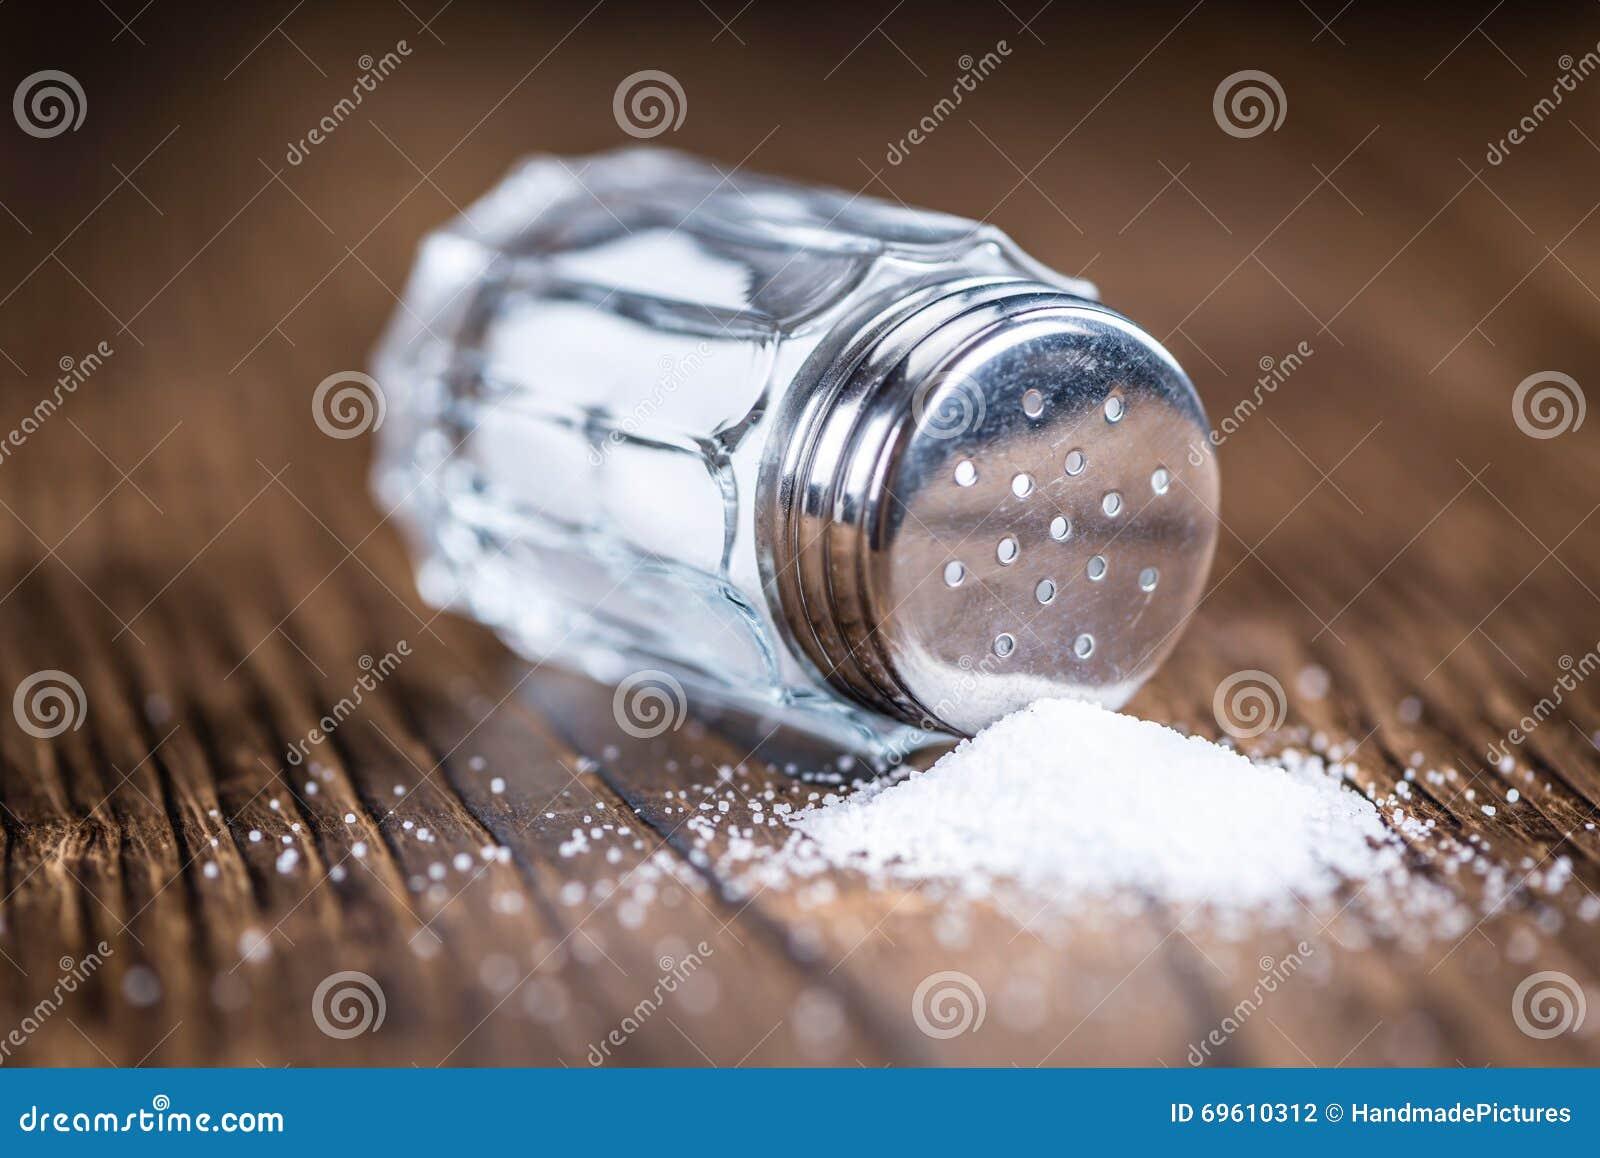 Salz-Schüttel-Apparat